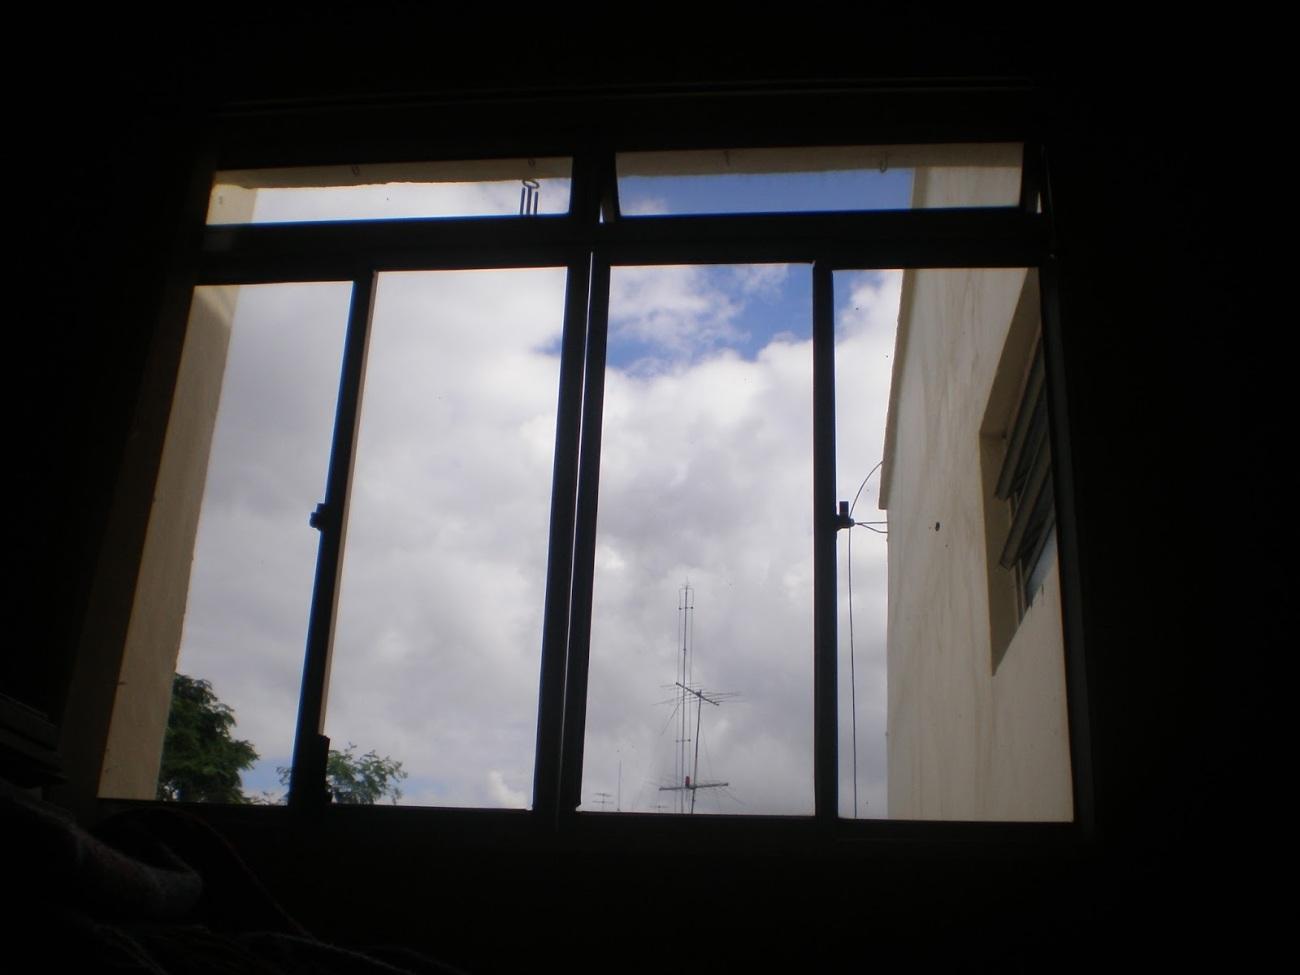 Céu da janela da sala - dezembro de 2014